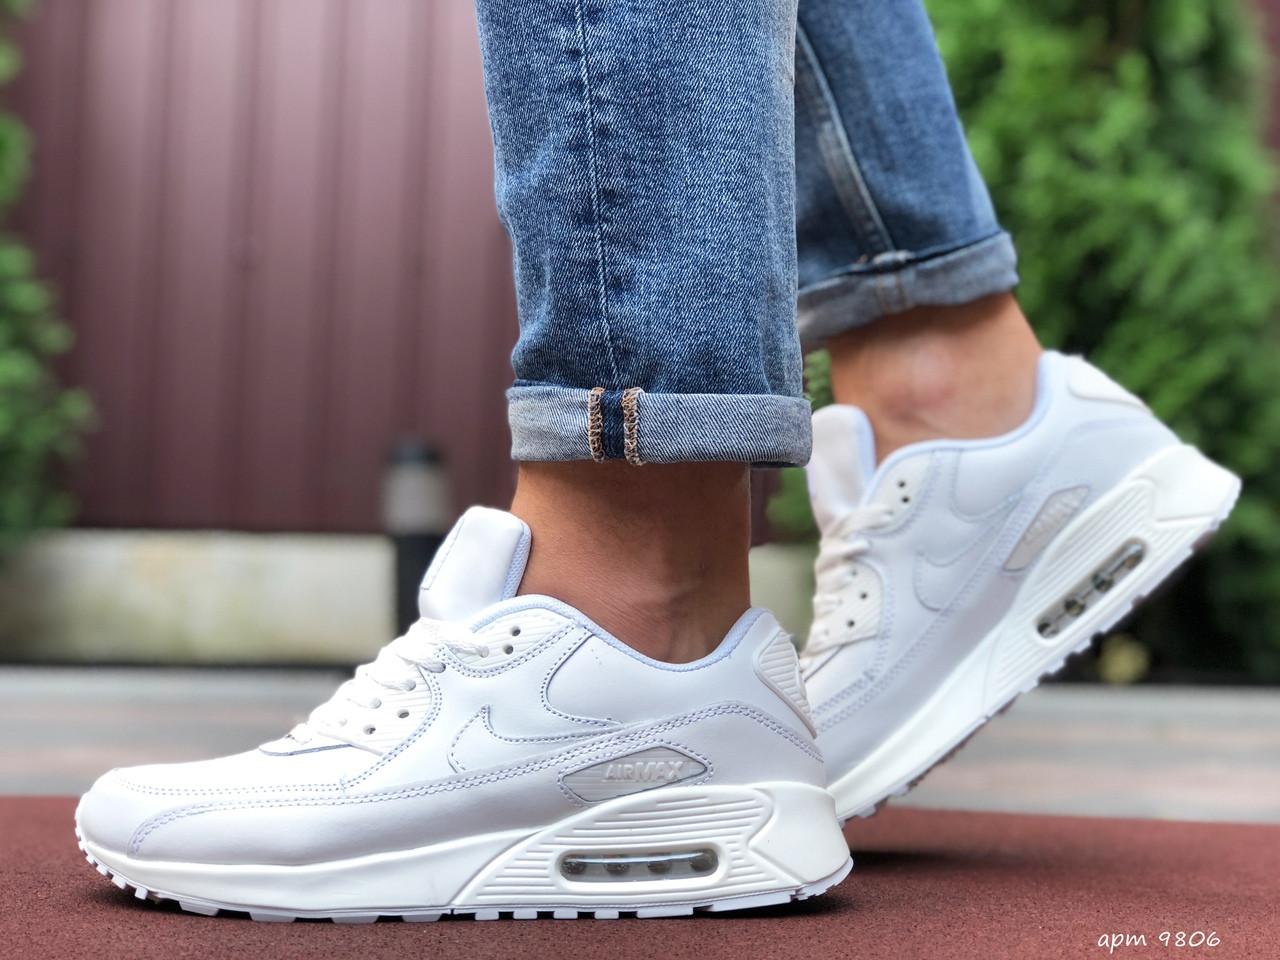 Мужские кроссовки Nike Air Max 90 (белые) 9806